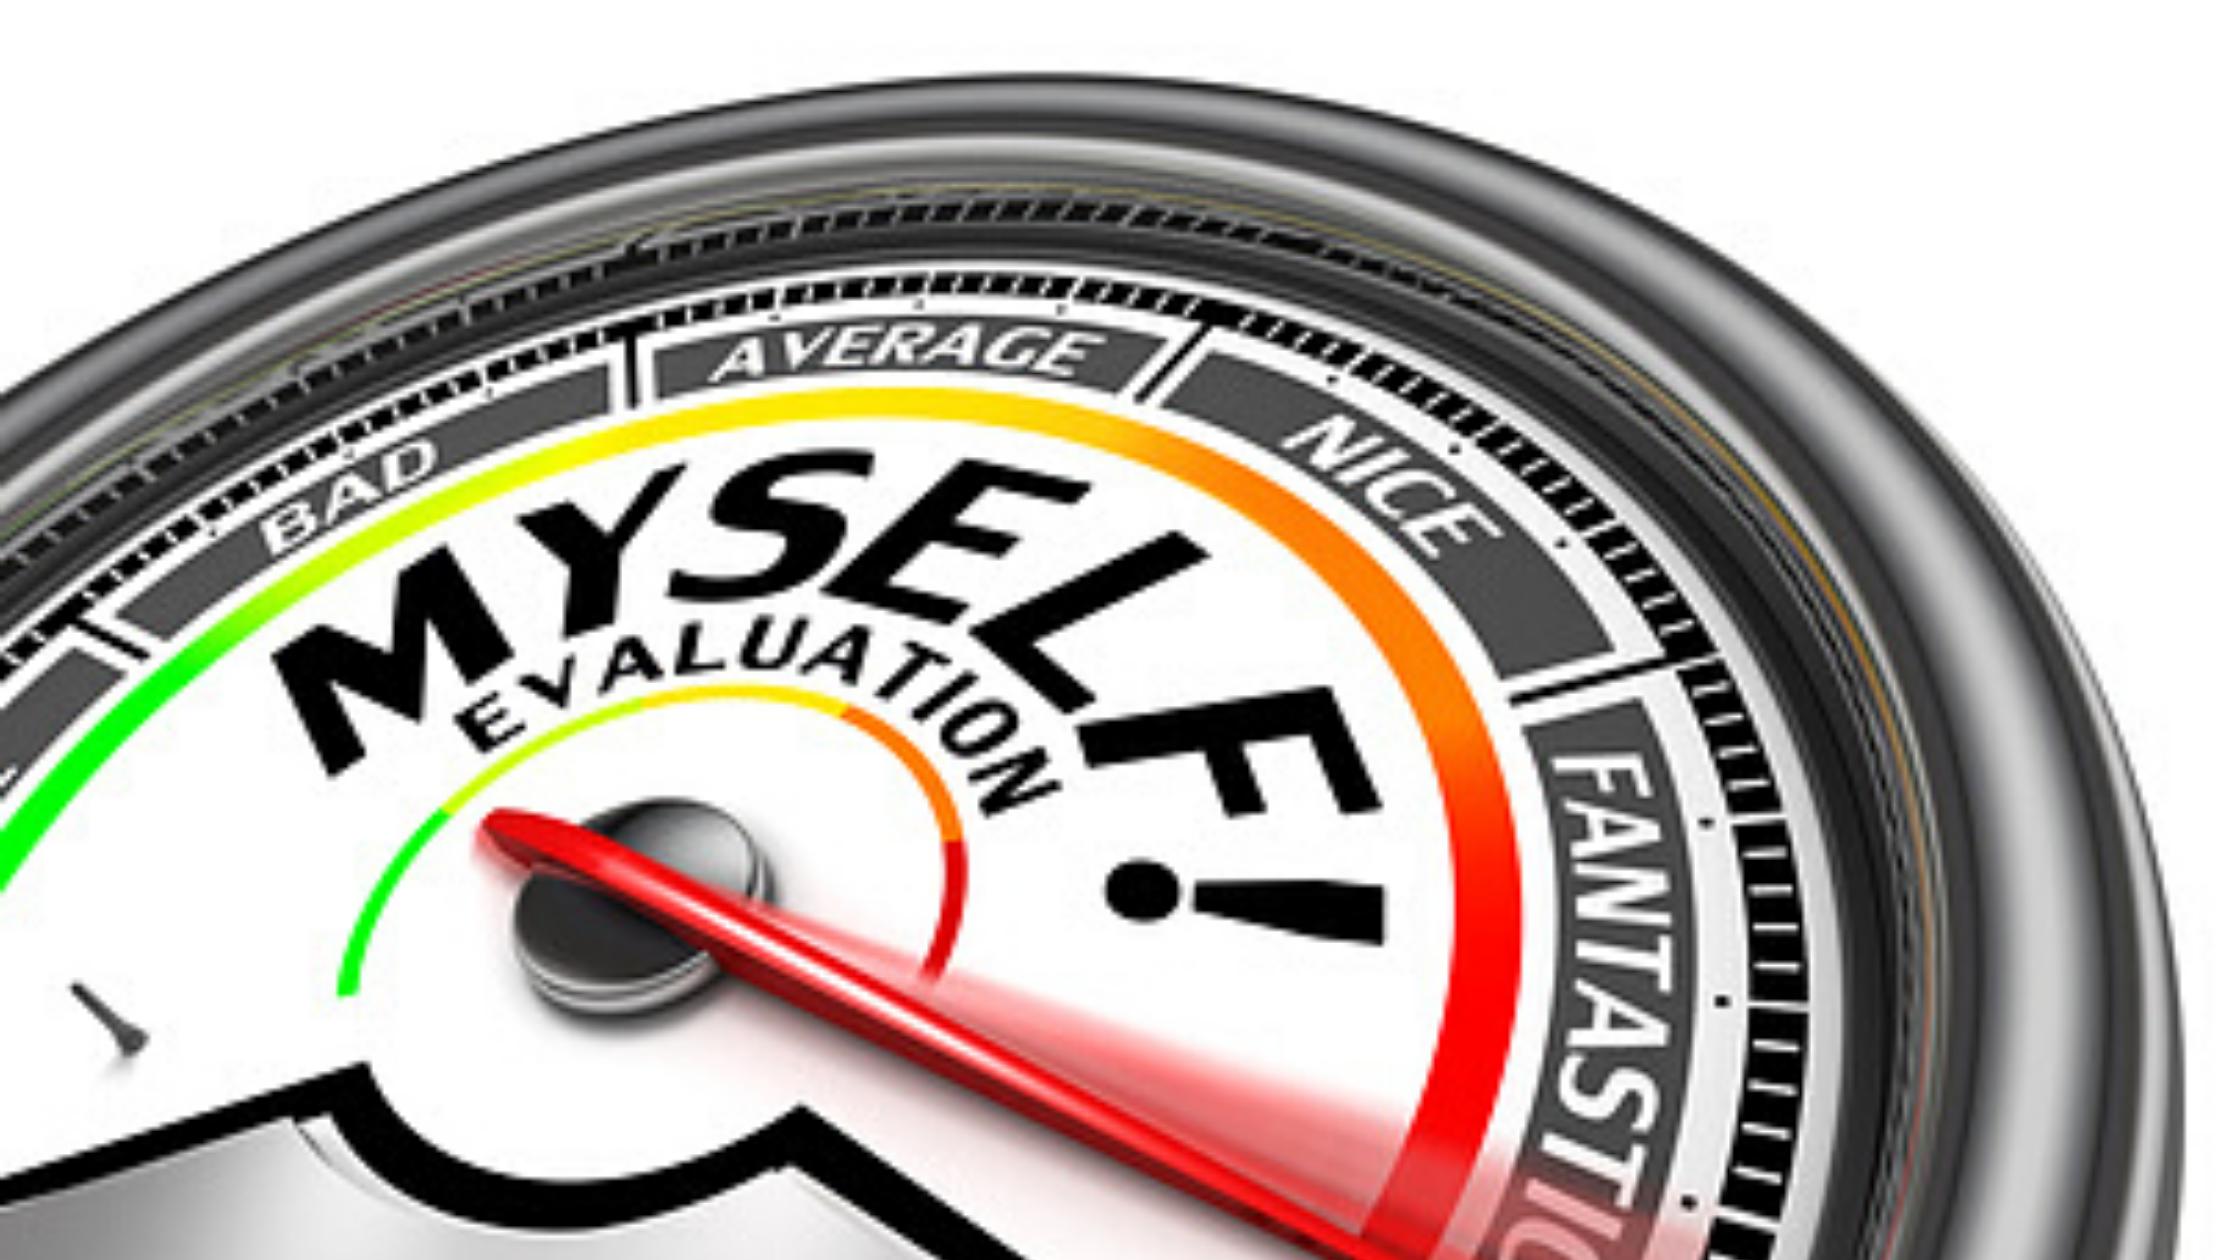 effektives energiemanagement check